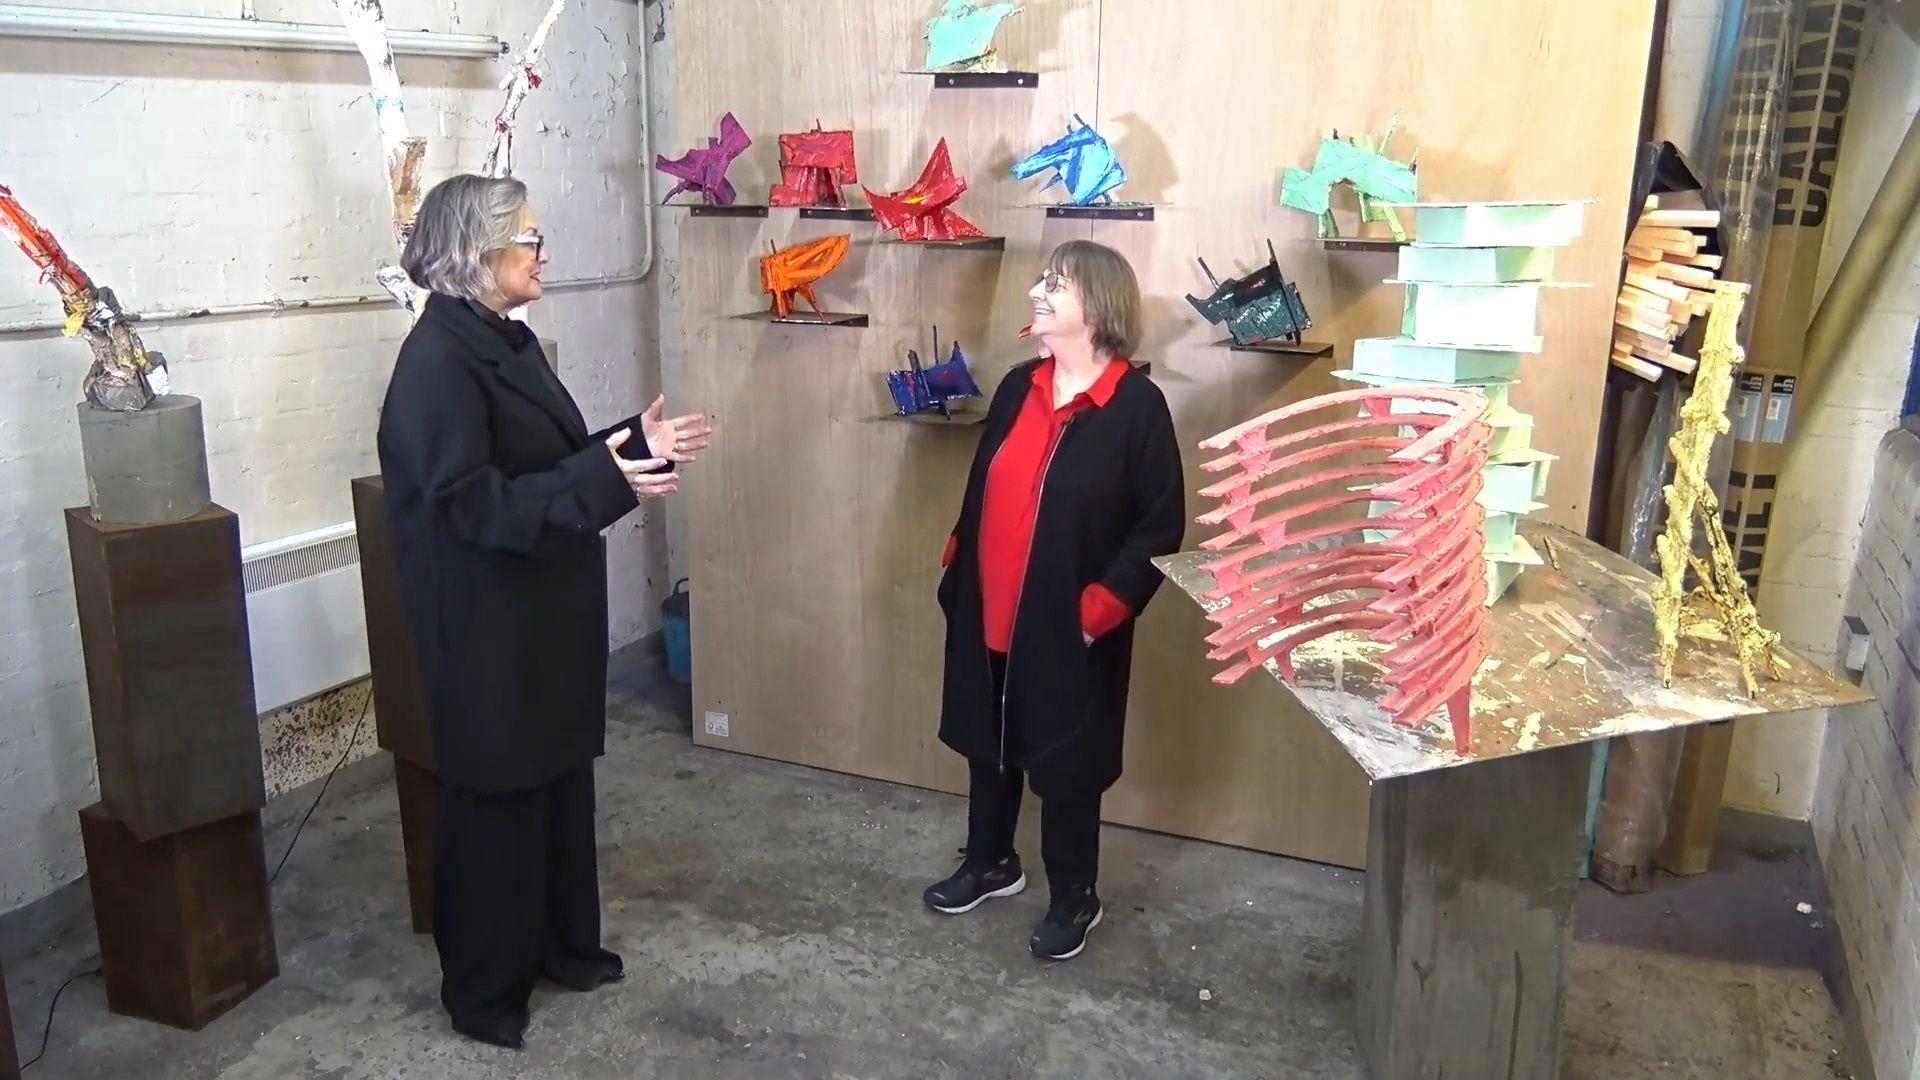 Phyllida Barlow (right) in conversation with CAS director Caroline Douglas